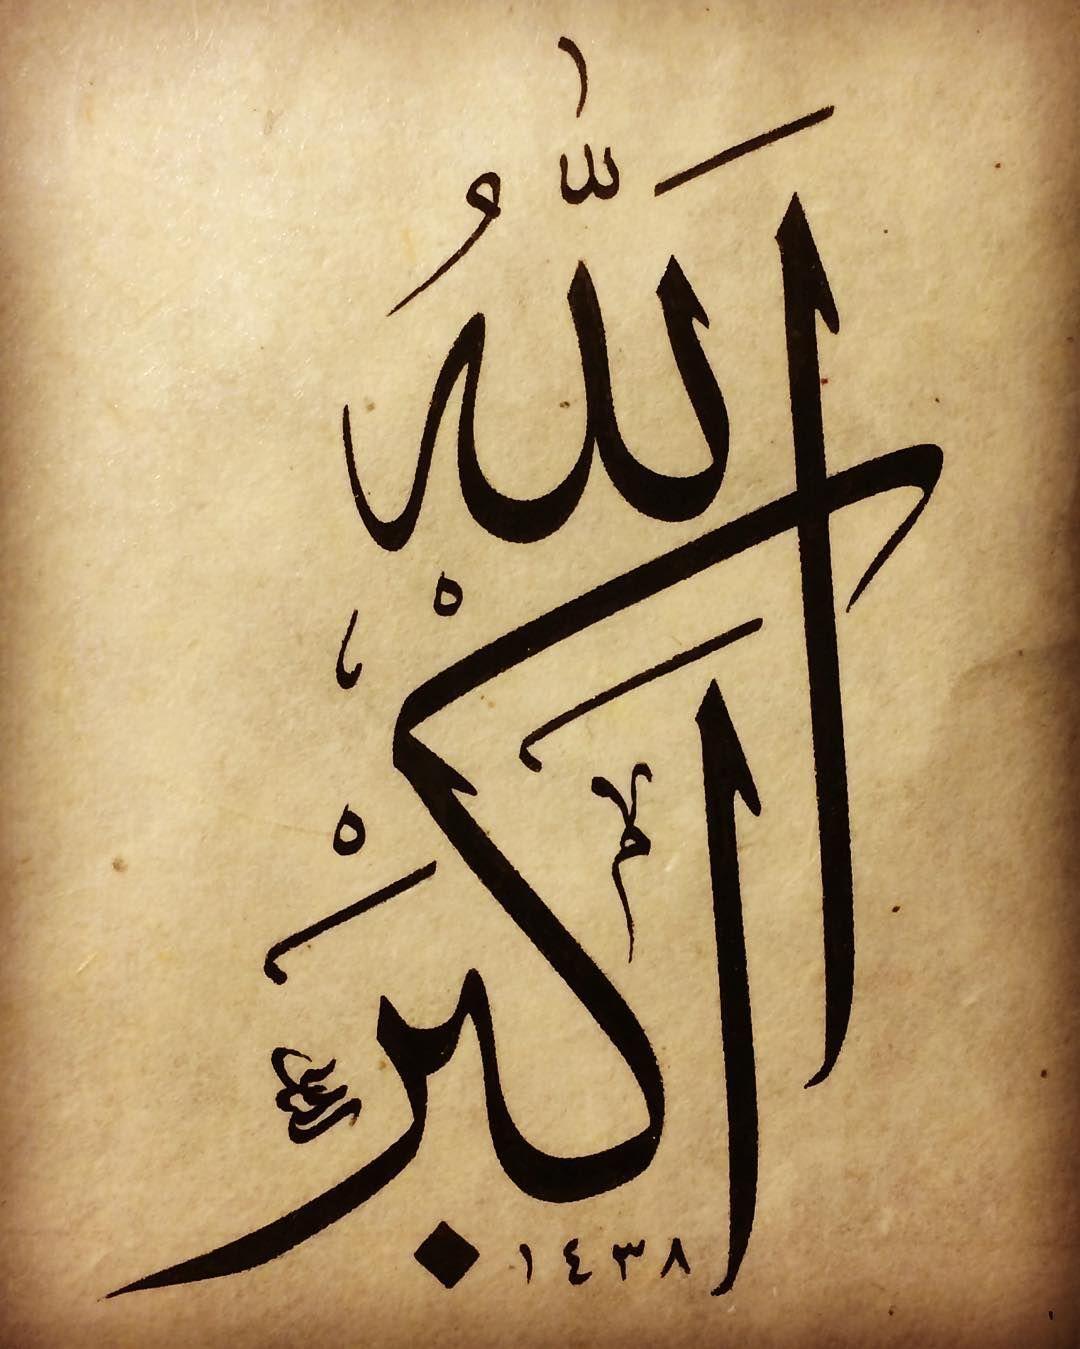 arapça mükemmel +100 laflar, 2020 Arapça kaligrafi